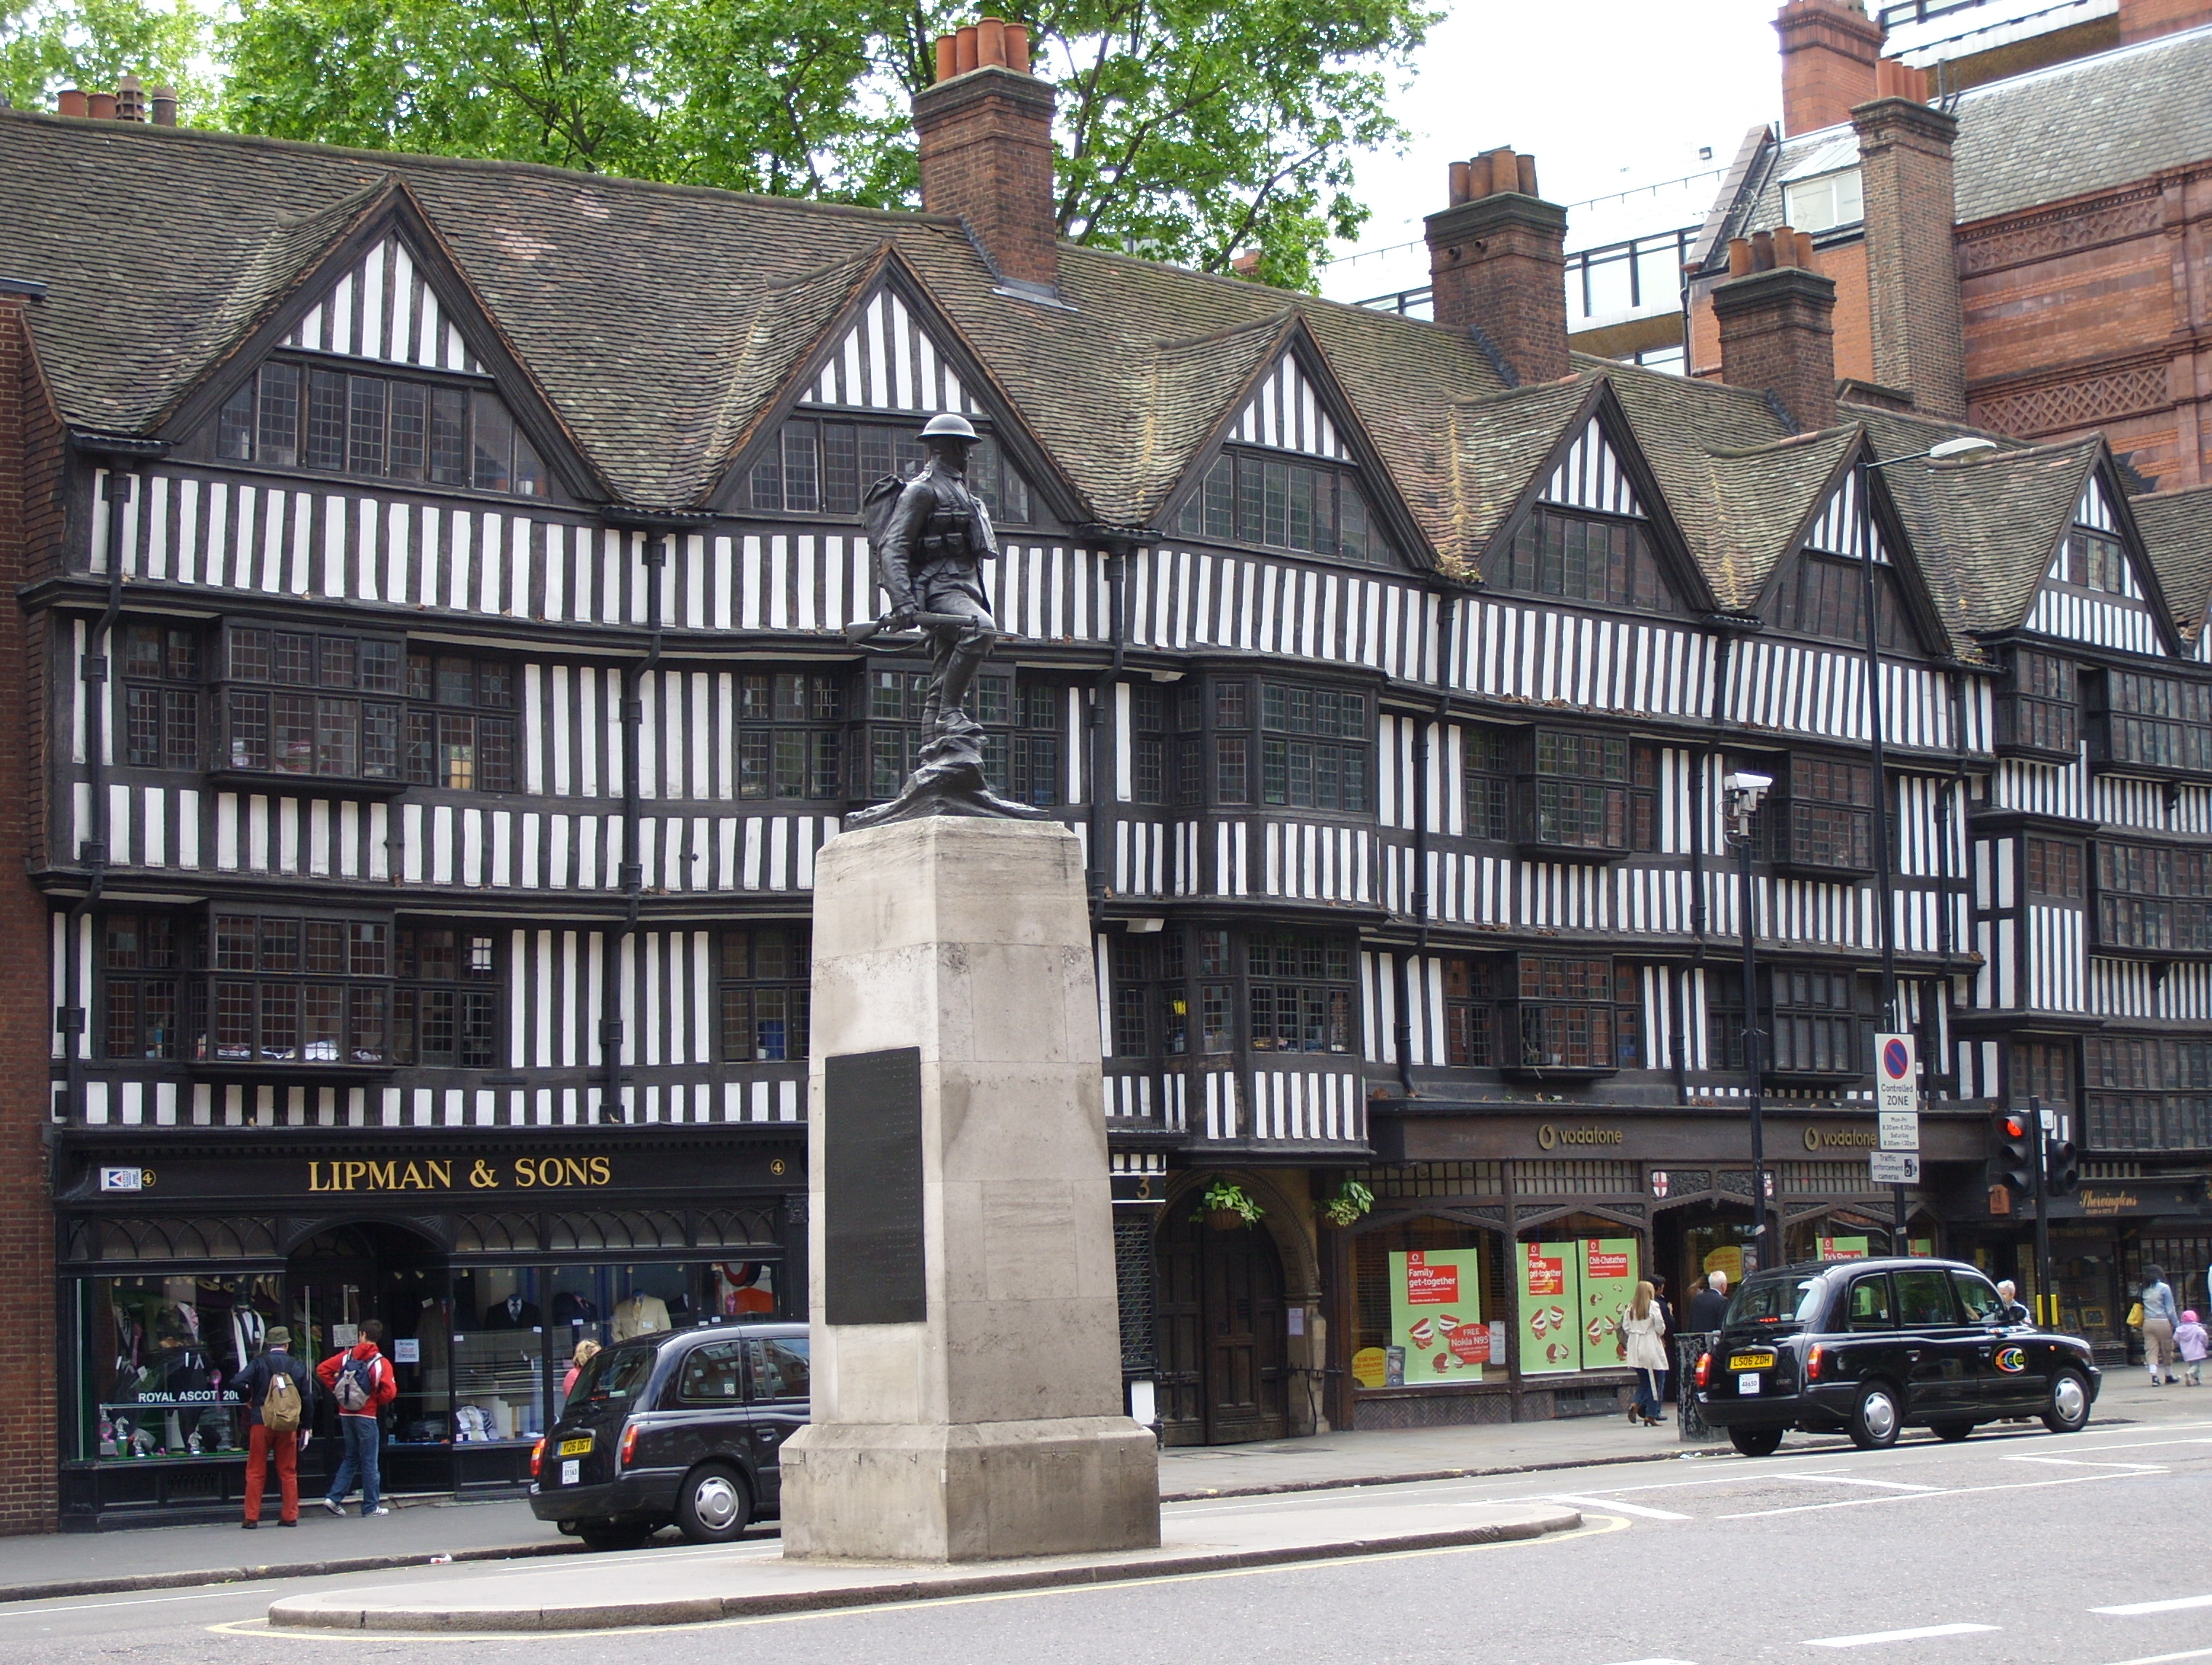 File:Half-timbered tudor buildings, High Holborn.JPG ...